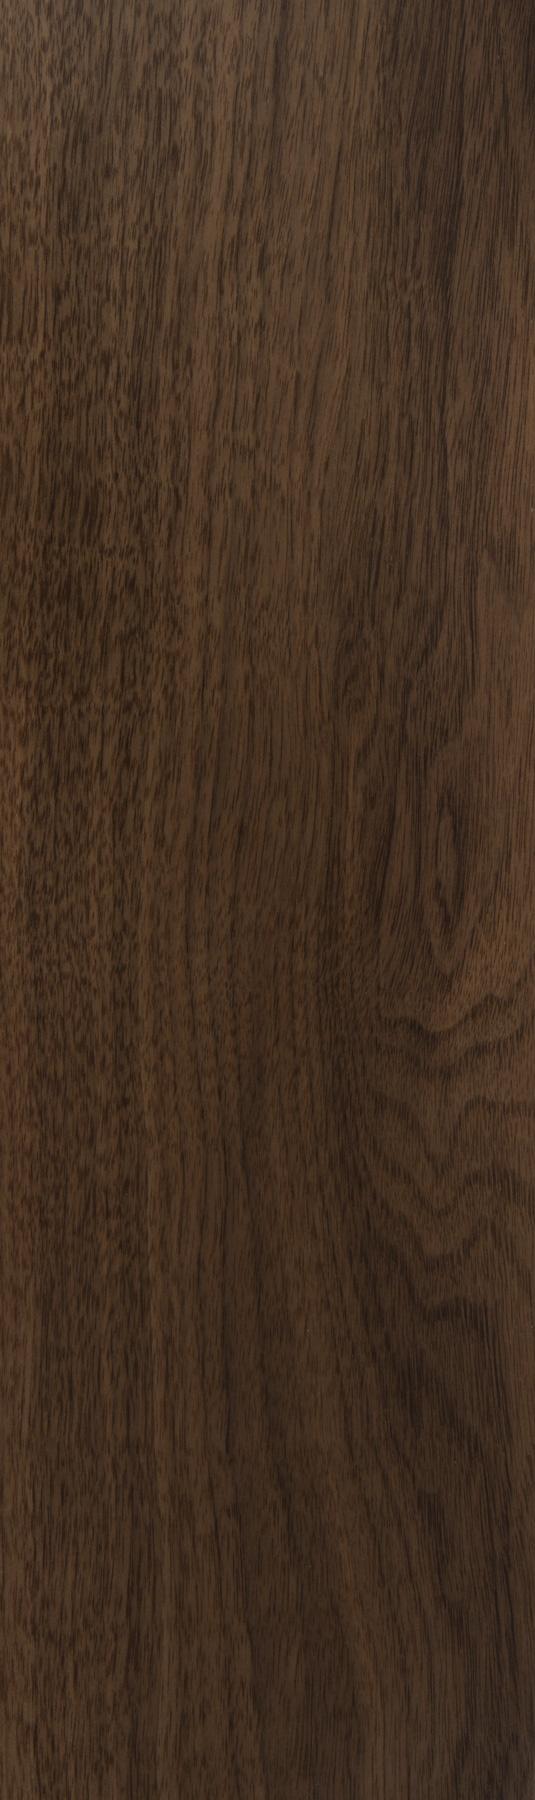 maderas-terramont-vitare-american-walnut